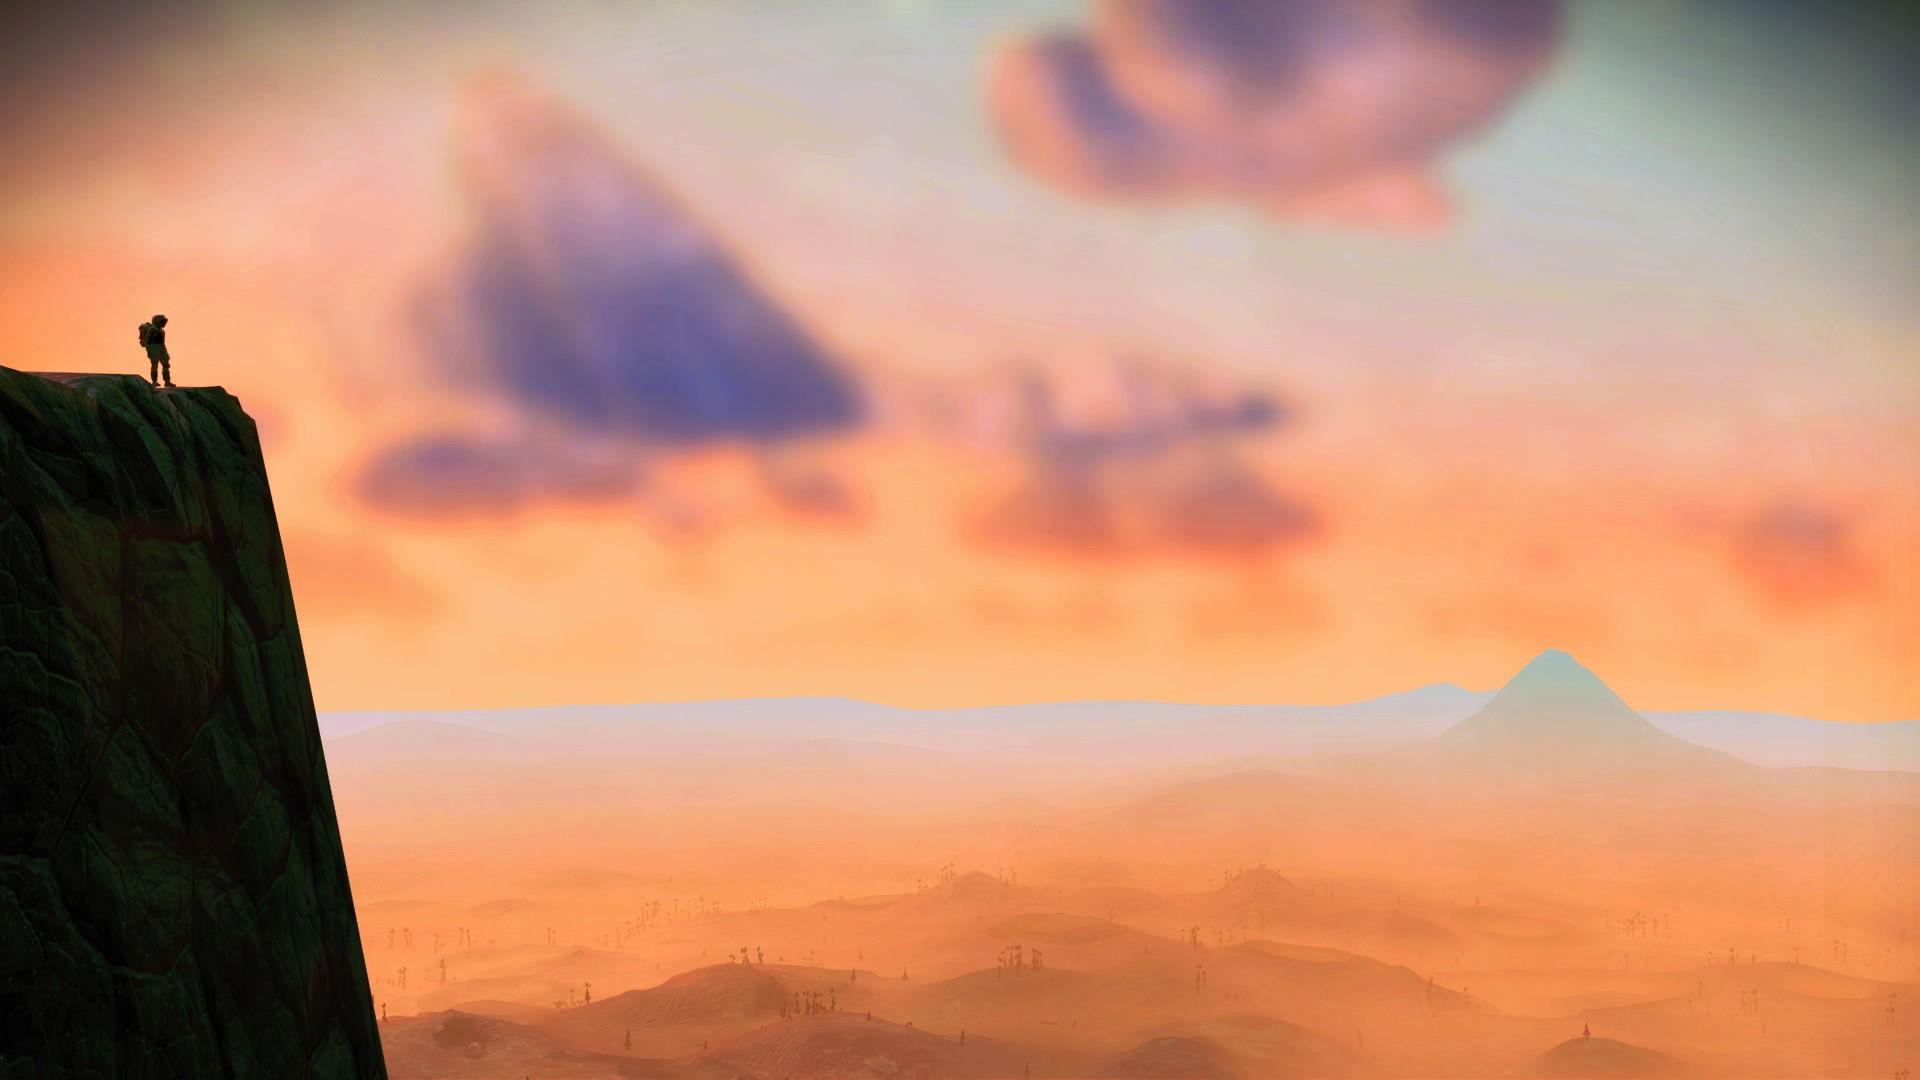 No Man's Sky: analisi versione Xbox One, raggiunge i 4K nativi